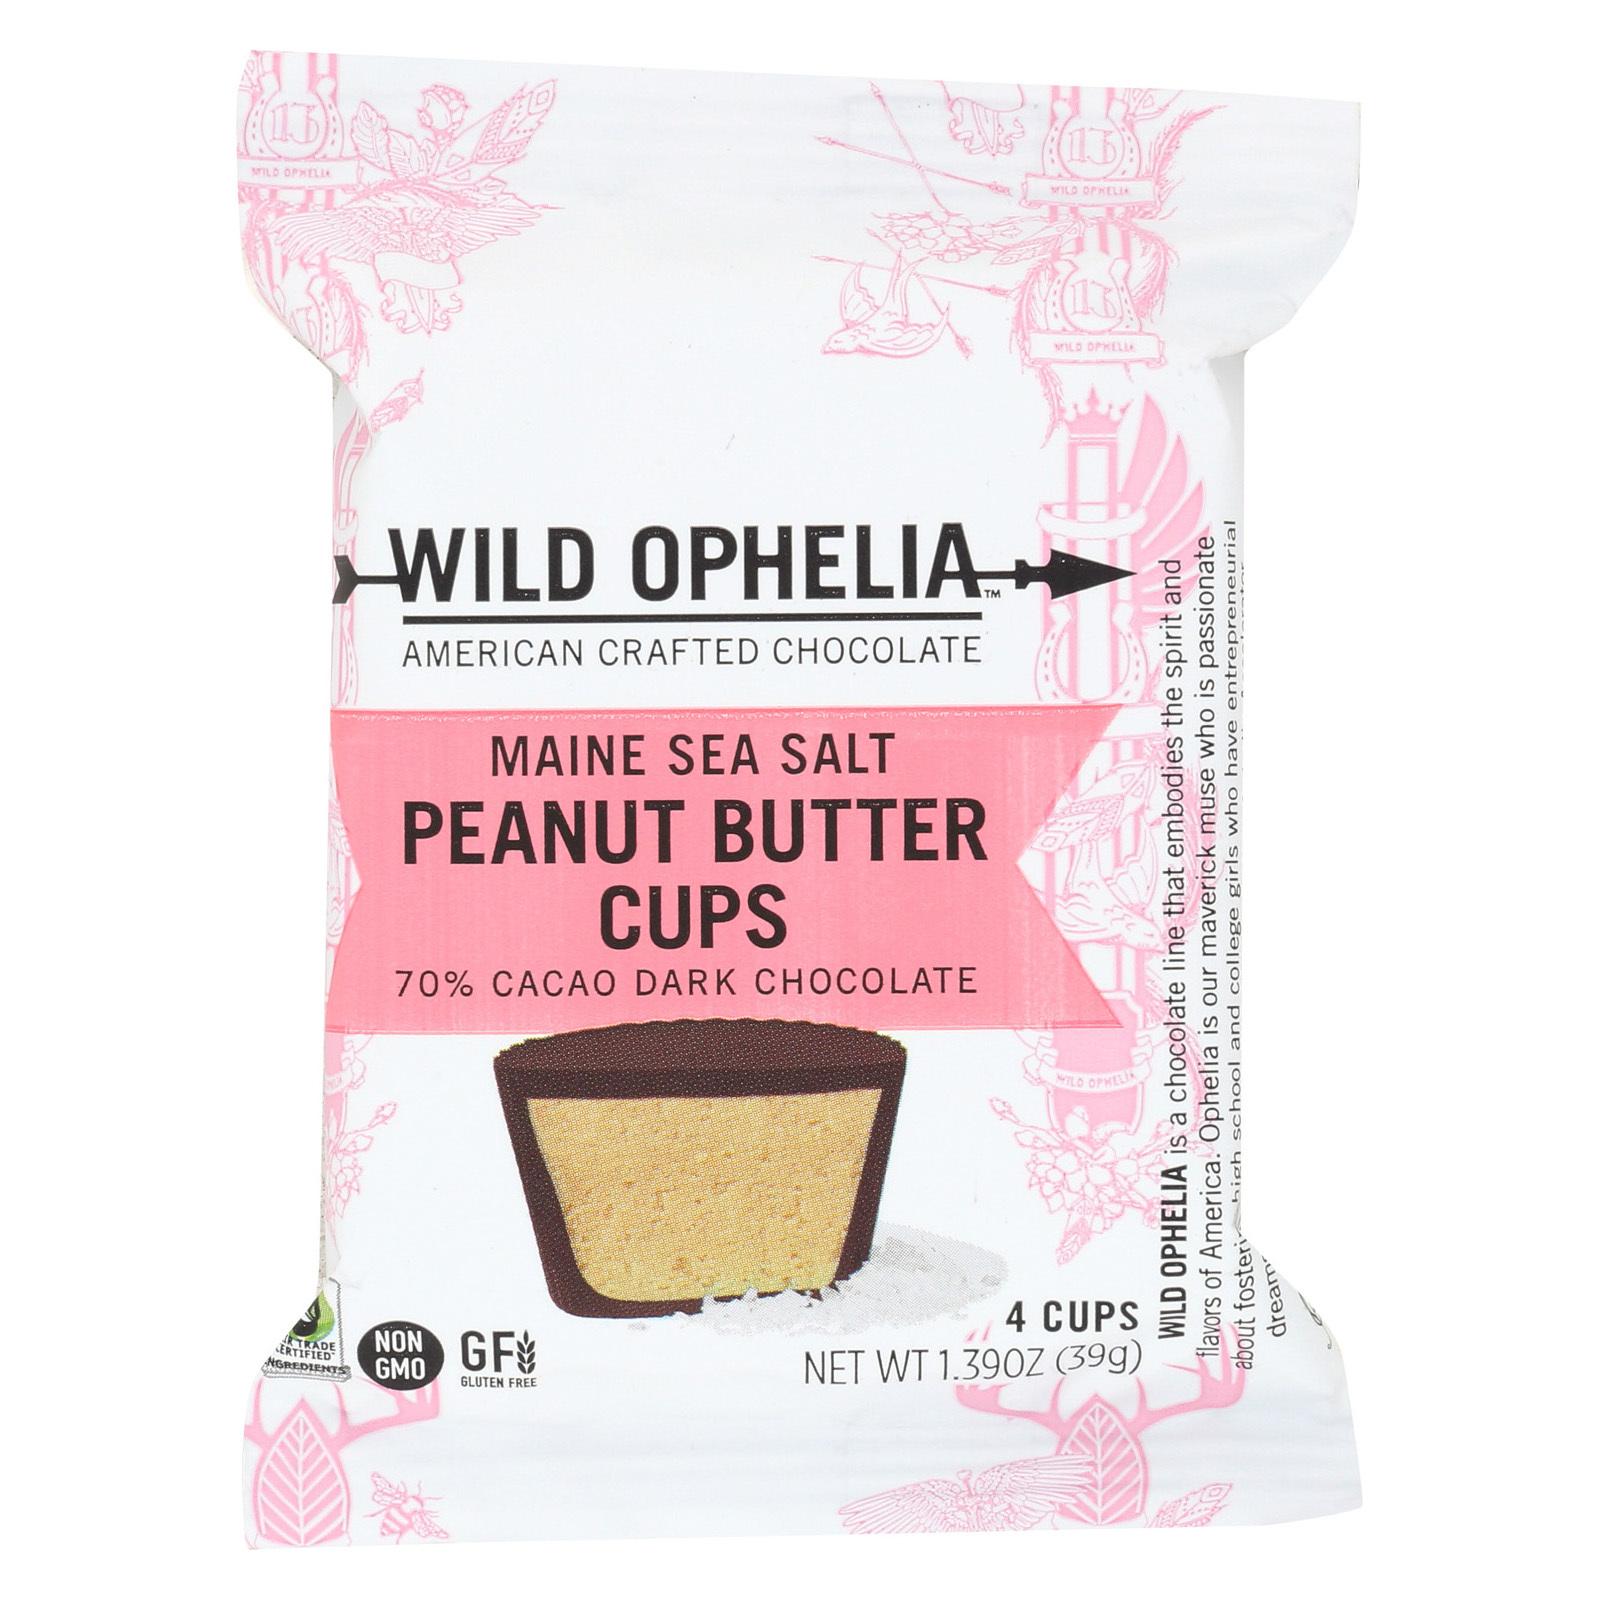 Wild Ophelia Peanut Butter Cup - Maine SeaSalt - Case of 12 - 1.37 oz